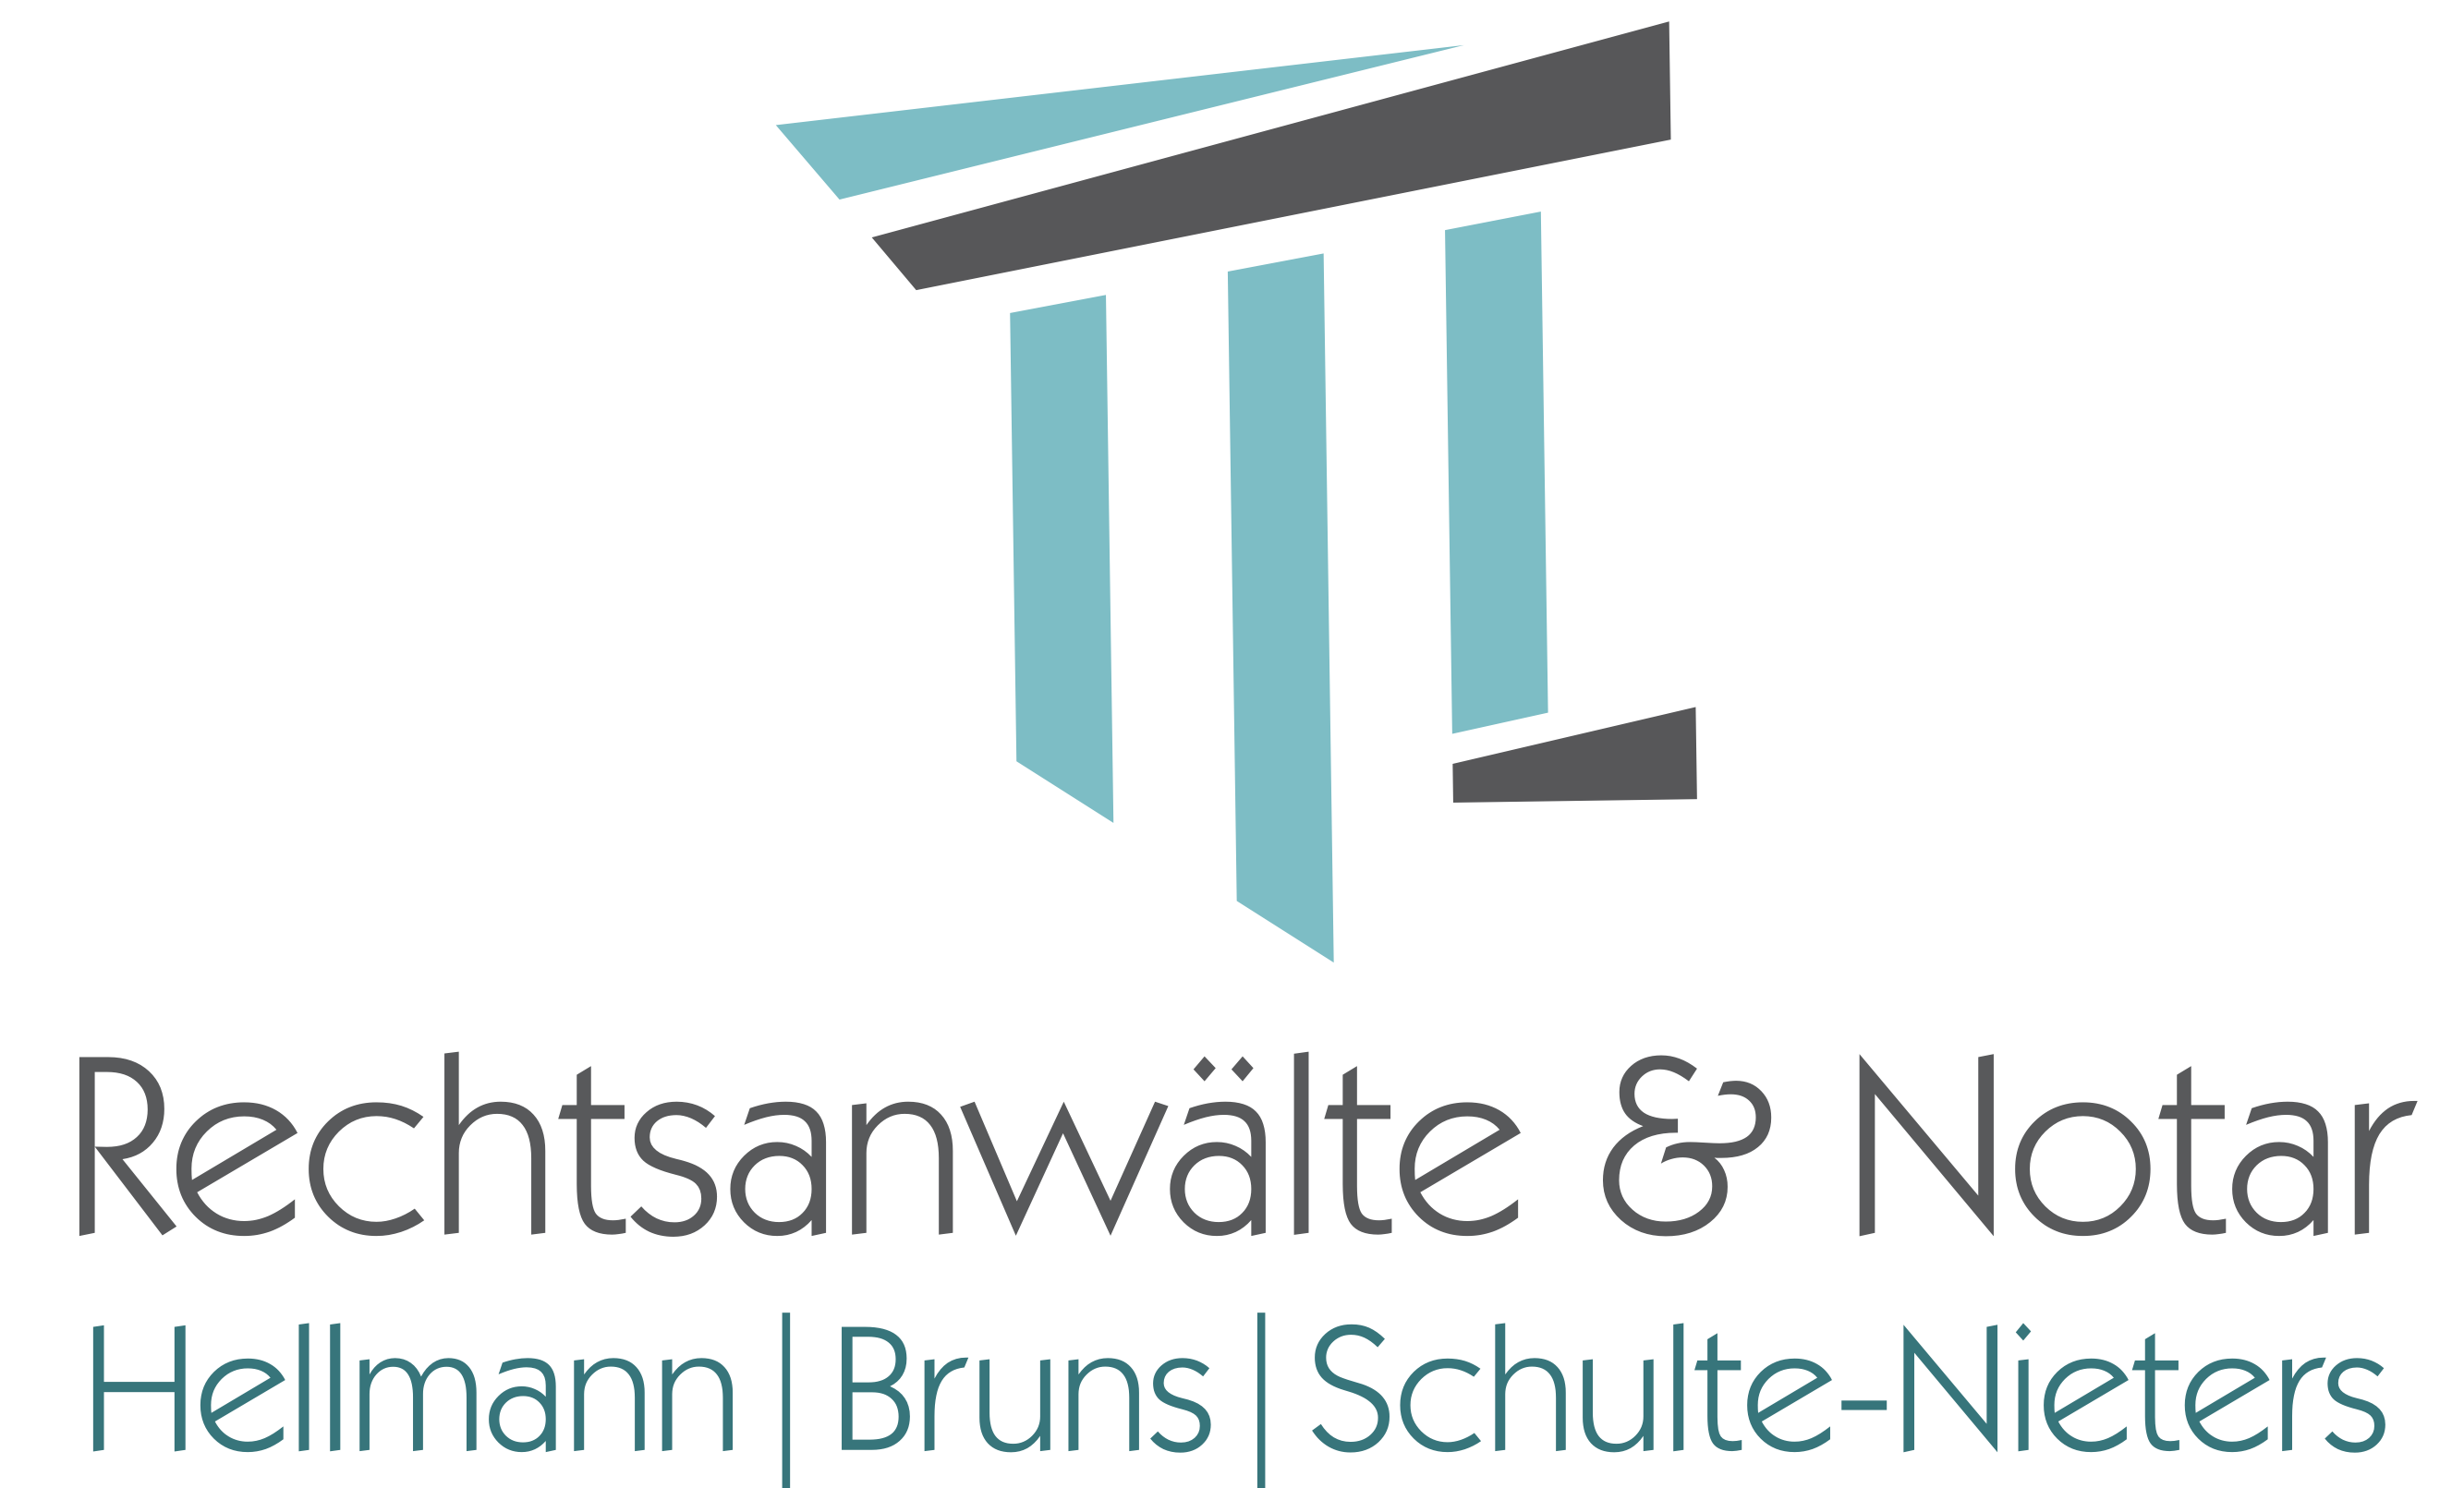 Rechtsanwälte & Notar Hellmann, Bruns & Schulte-Nieters